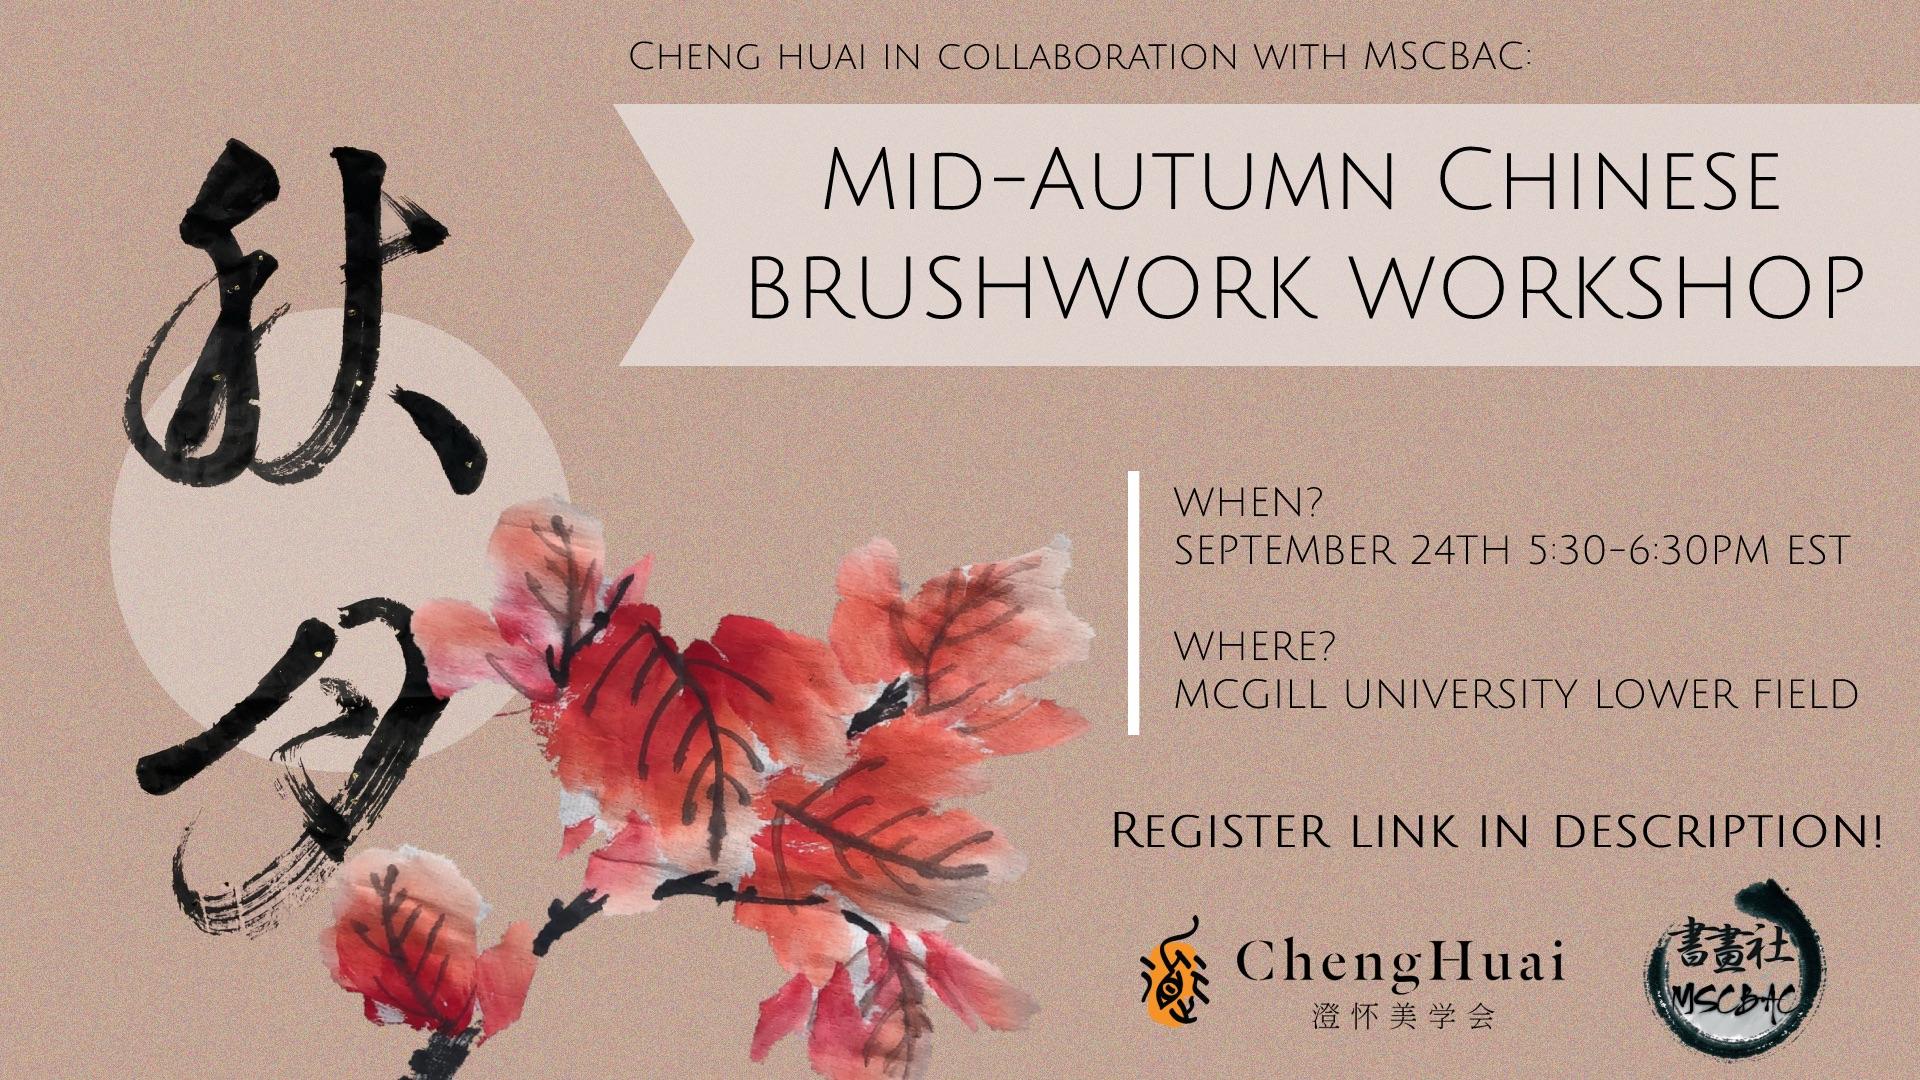 Mid-Autumn Chinese Brushwork Painting Workshop